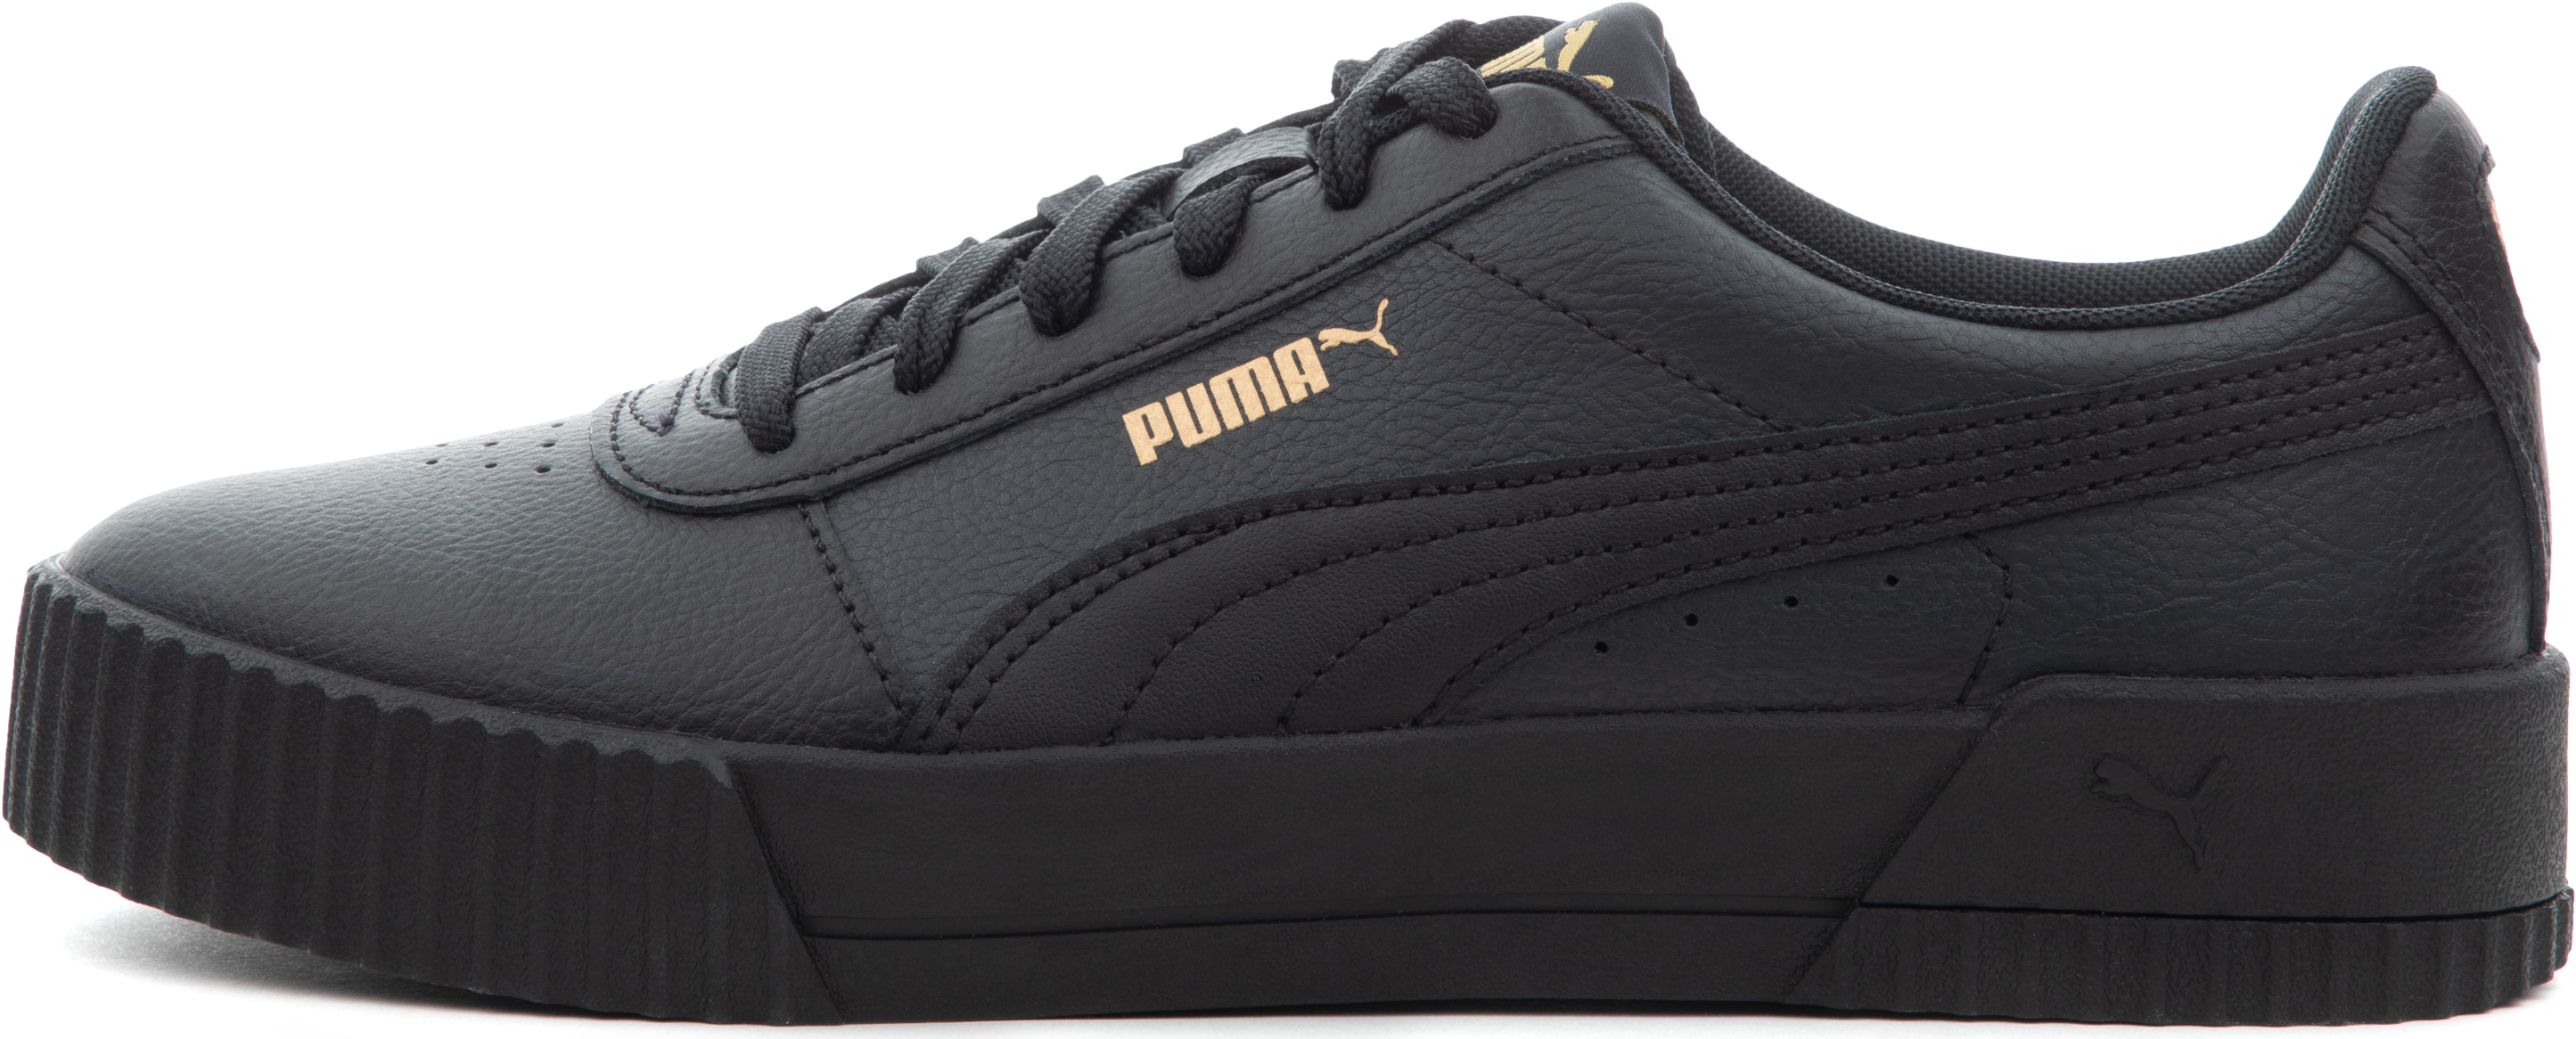 Puma Кеды женские W Carina, размер 37